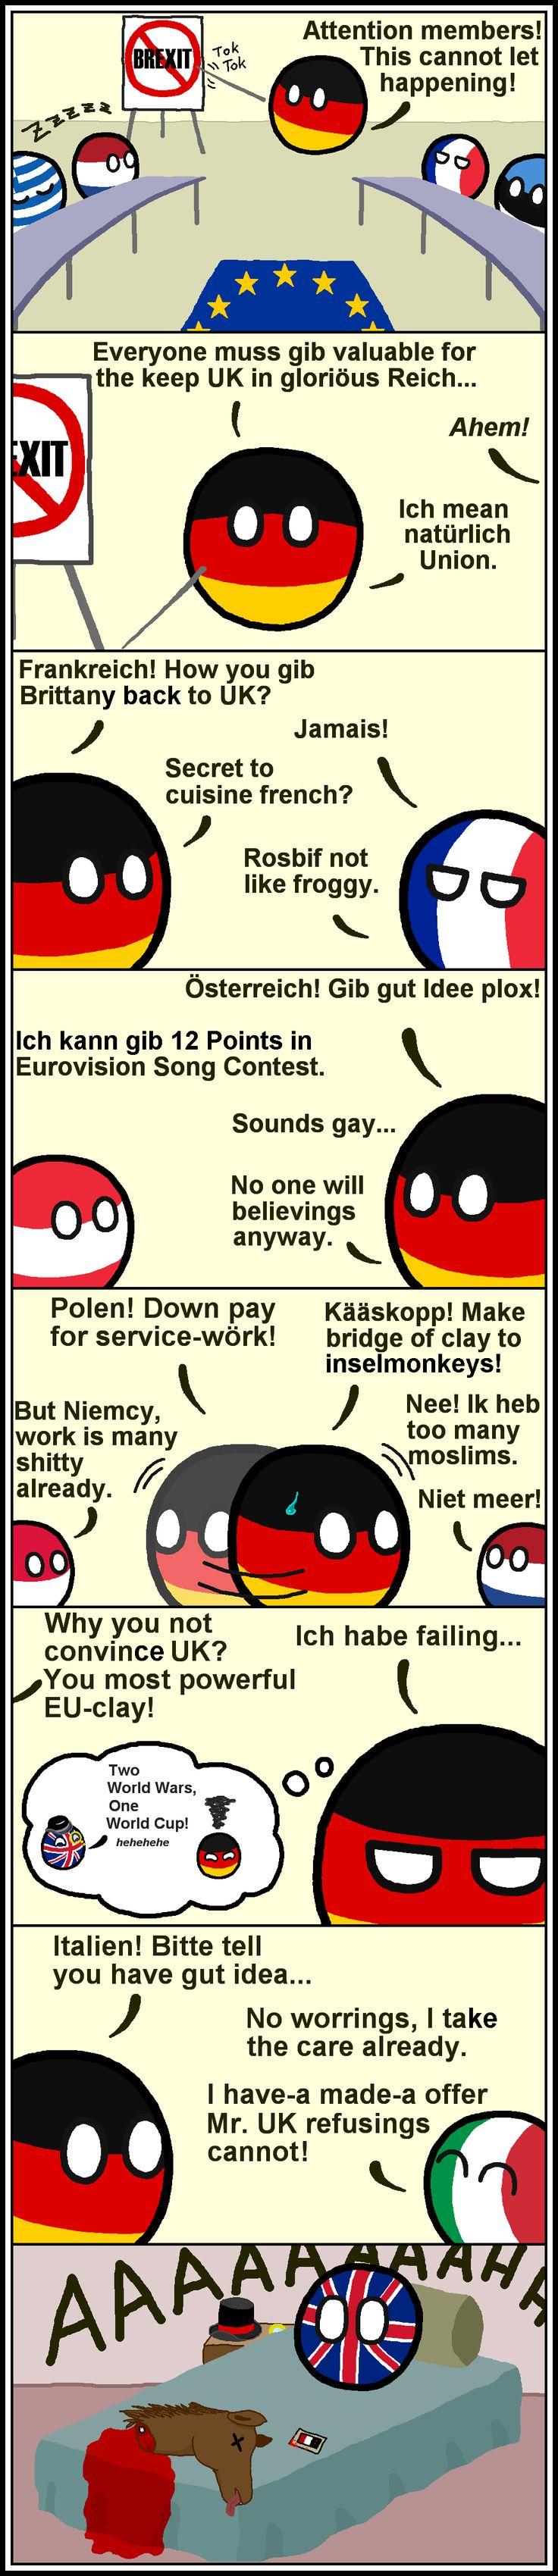 schwarzer humor - Seite 220 - ngb | ^ https://de.pinterest.com/MrCrosspatch/countryballs/